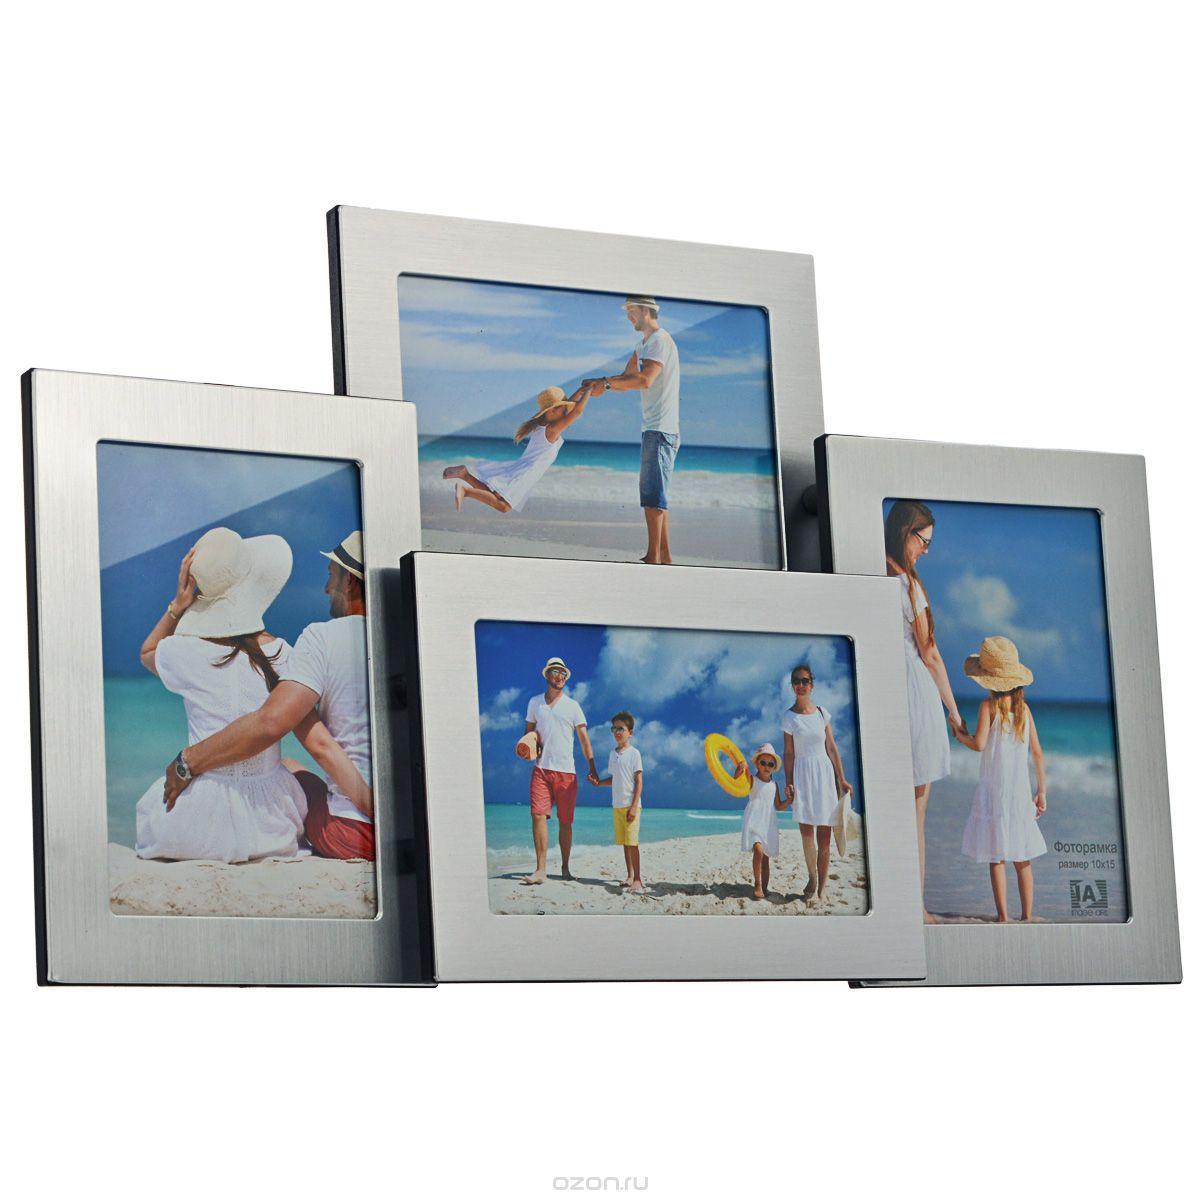 Фоторамка Image Art, цвет: серебристый, на 4 фото, 10 х 15 см 5055398692677